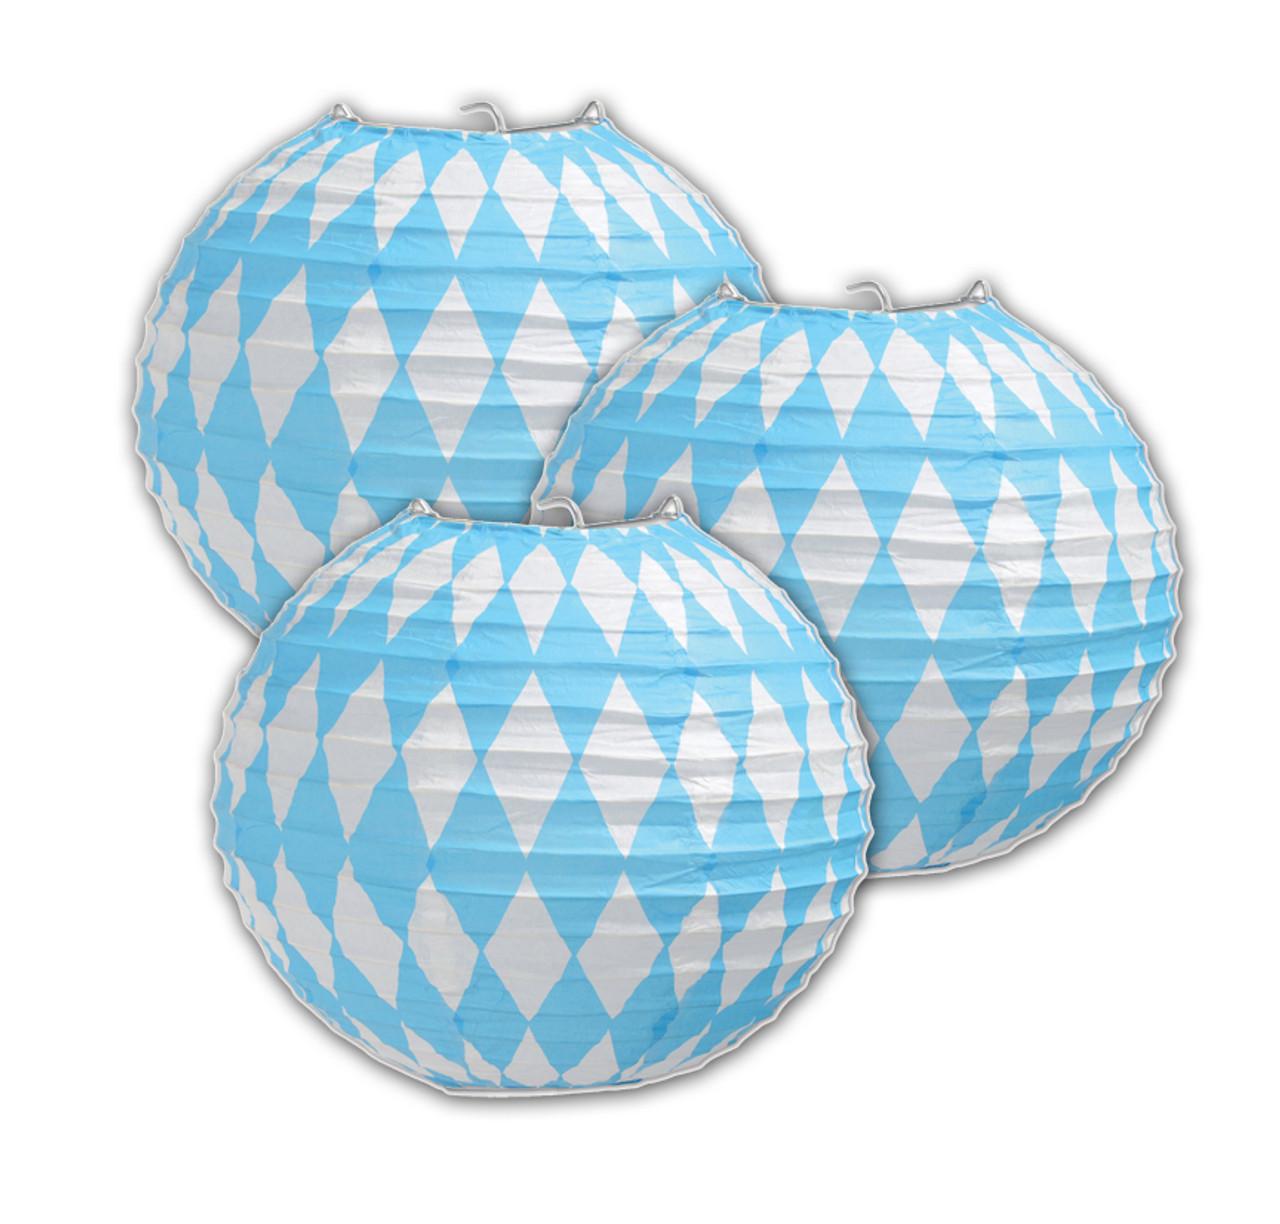 Bavarian Flag Oktoberfest Party Paper Lantern Decoration 3 pack